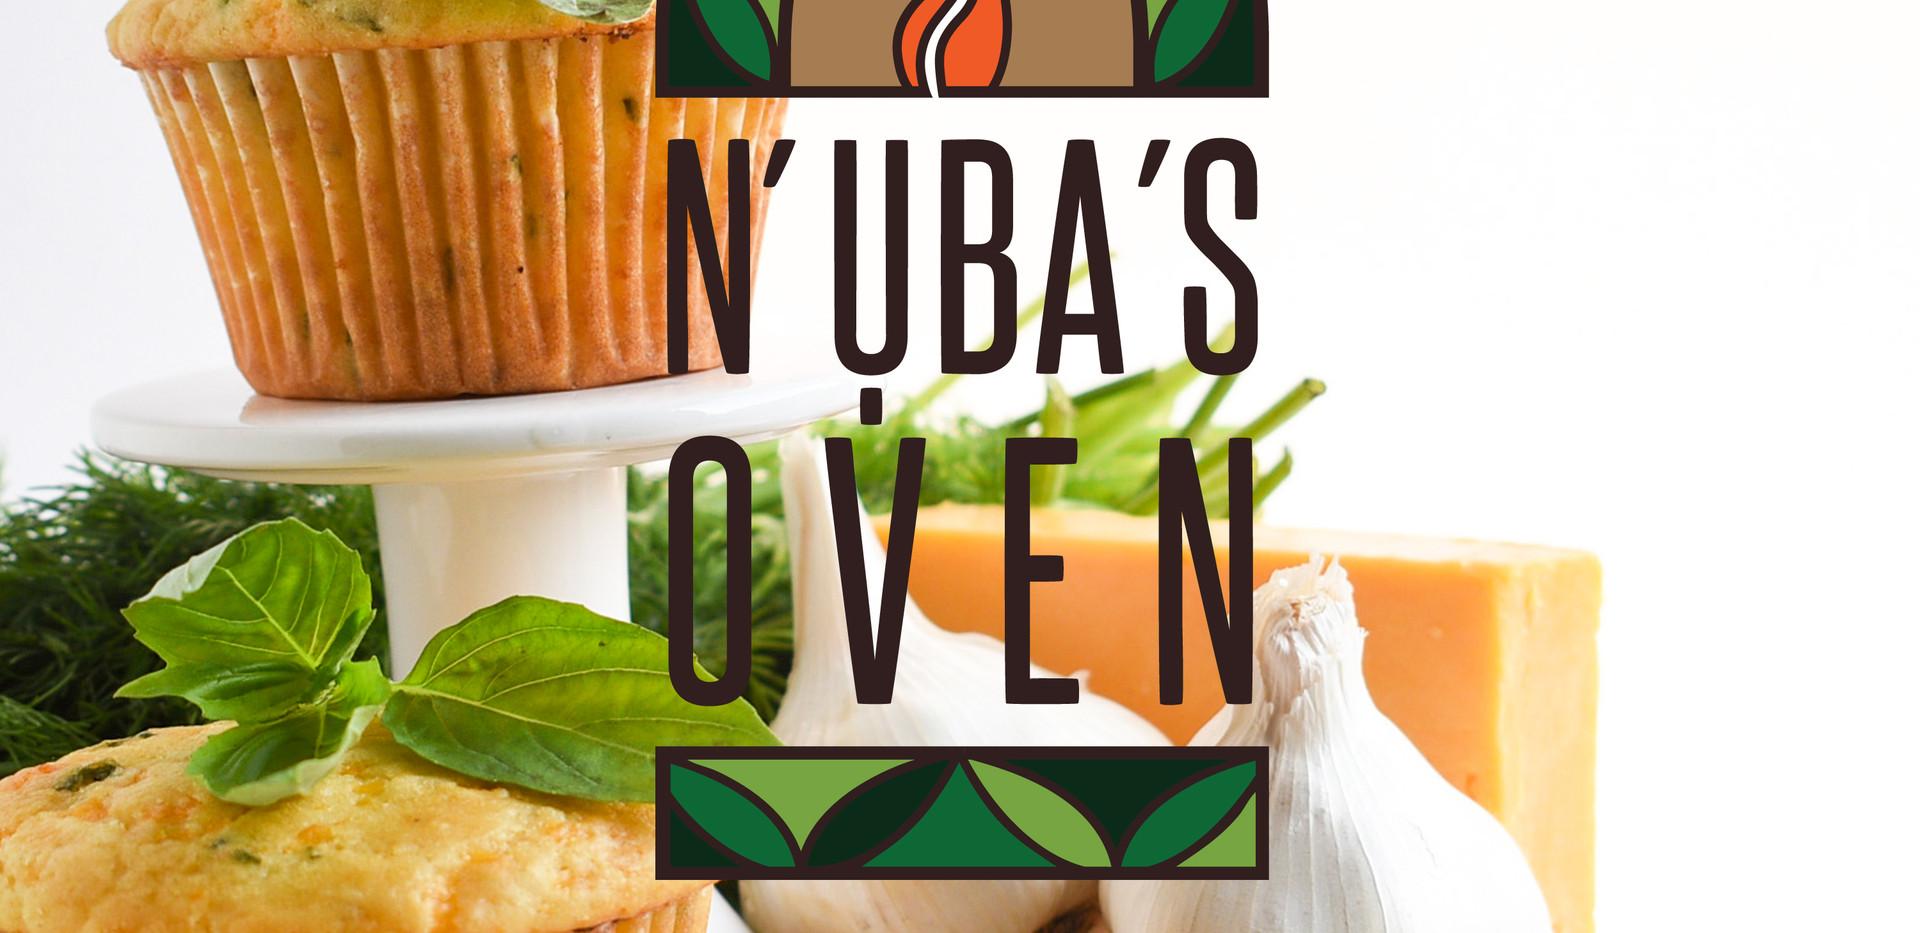 Nuba's Oven Product Photography